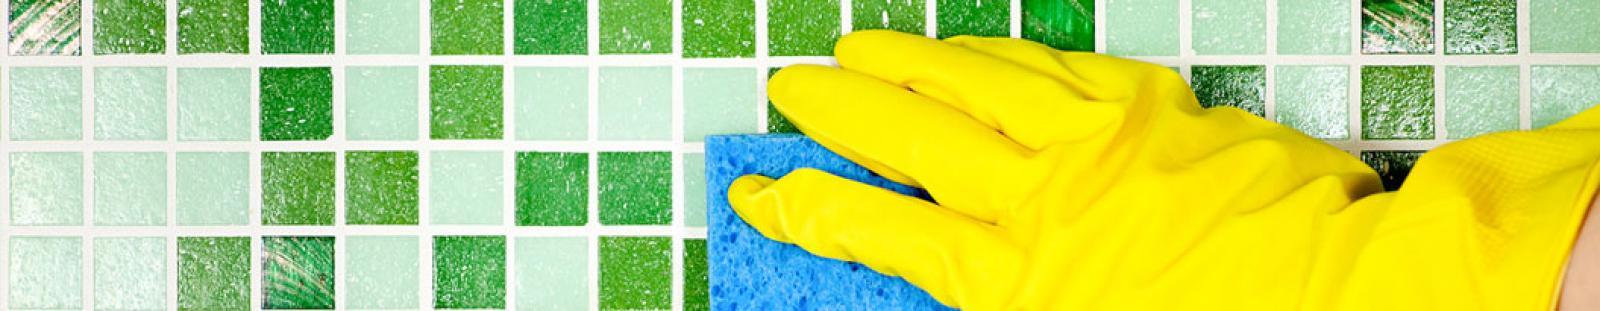 image of custodian scrubbing bathroom tiles